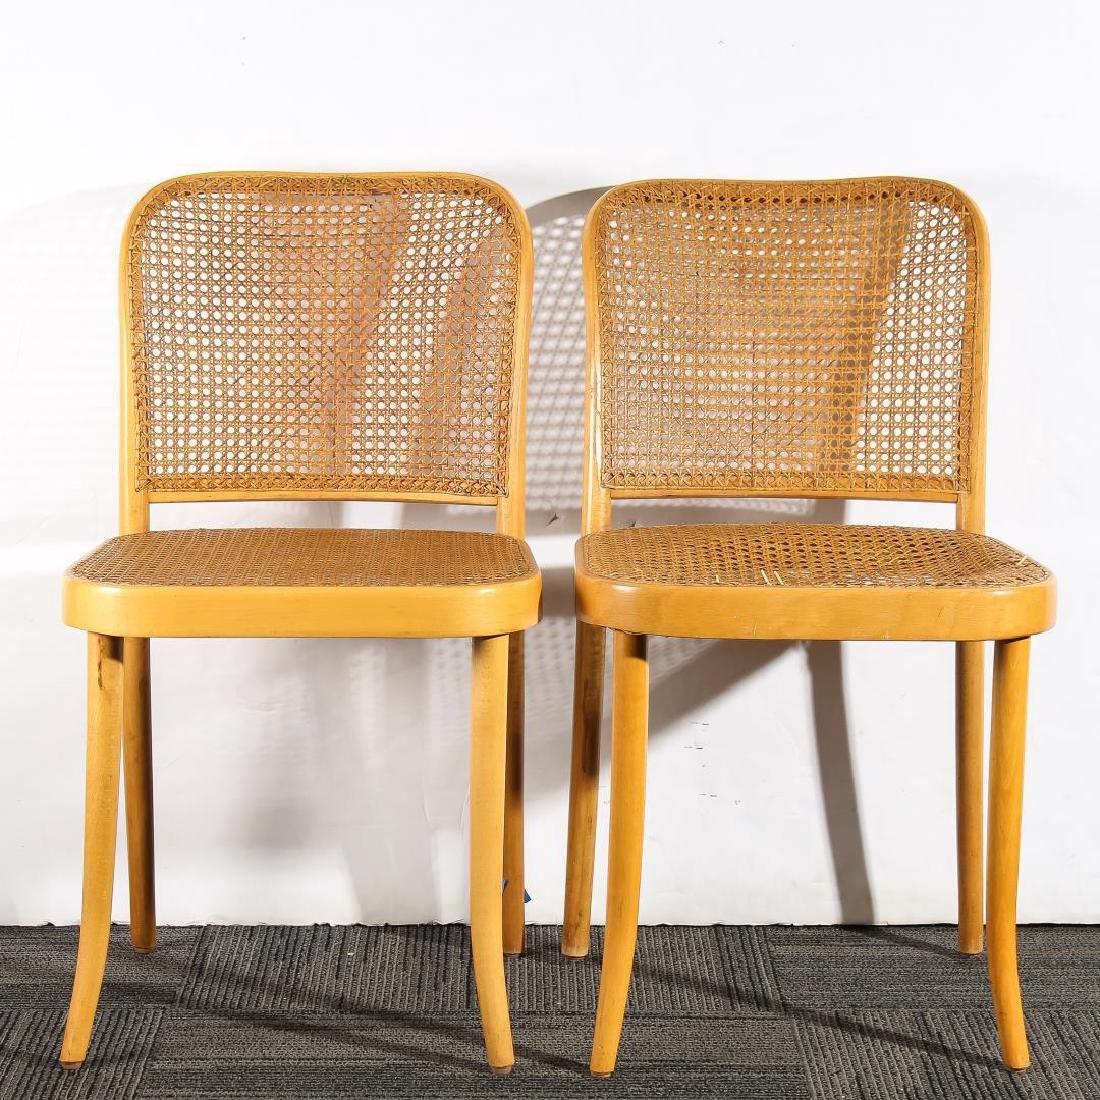 Original Stendig Thonet Bentwood Cane Chairs, Pair